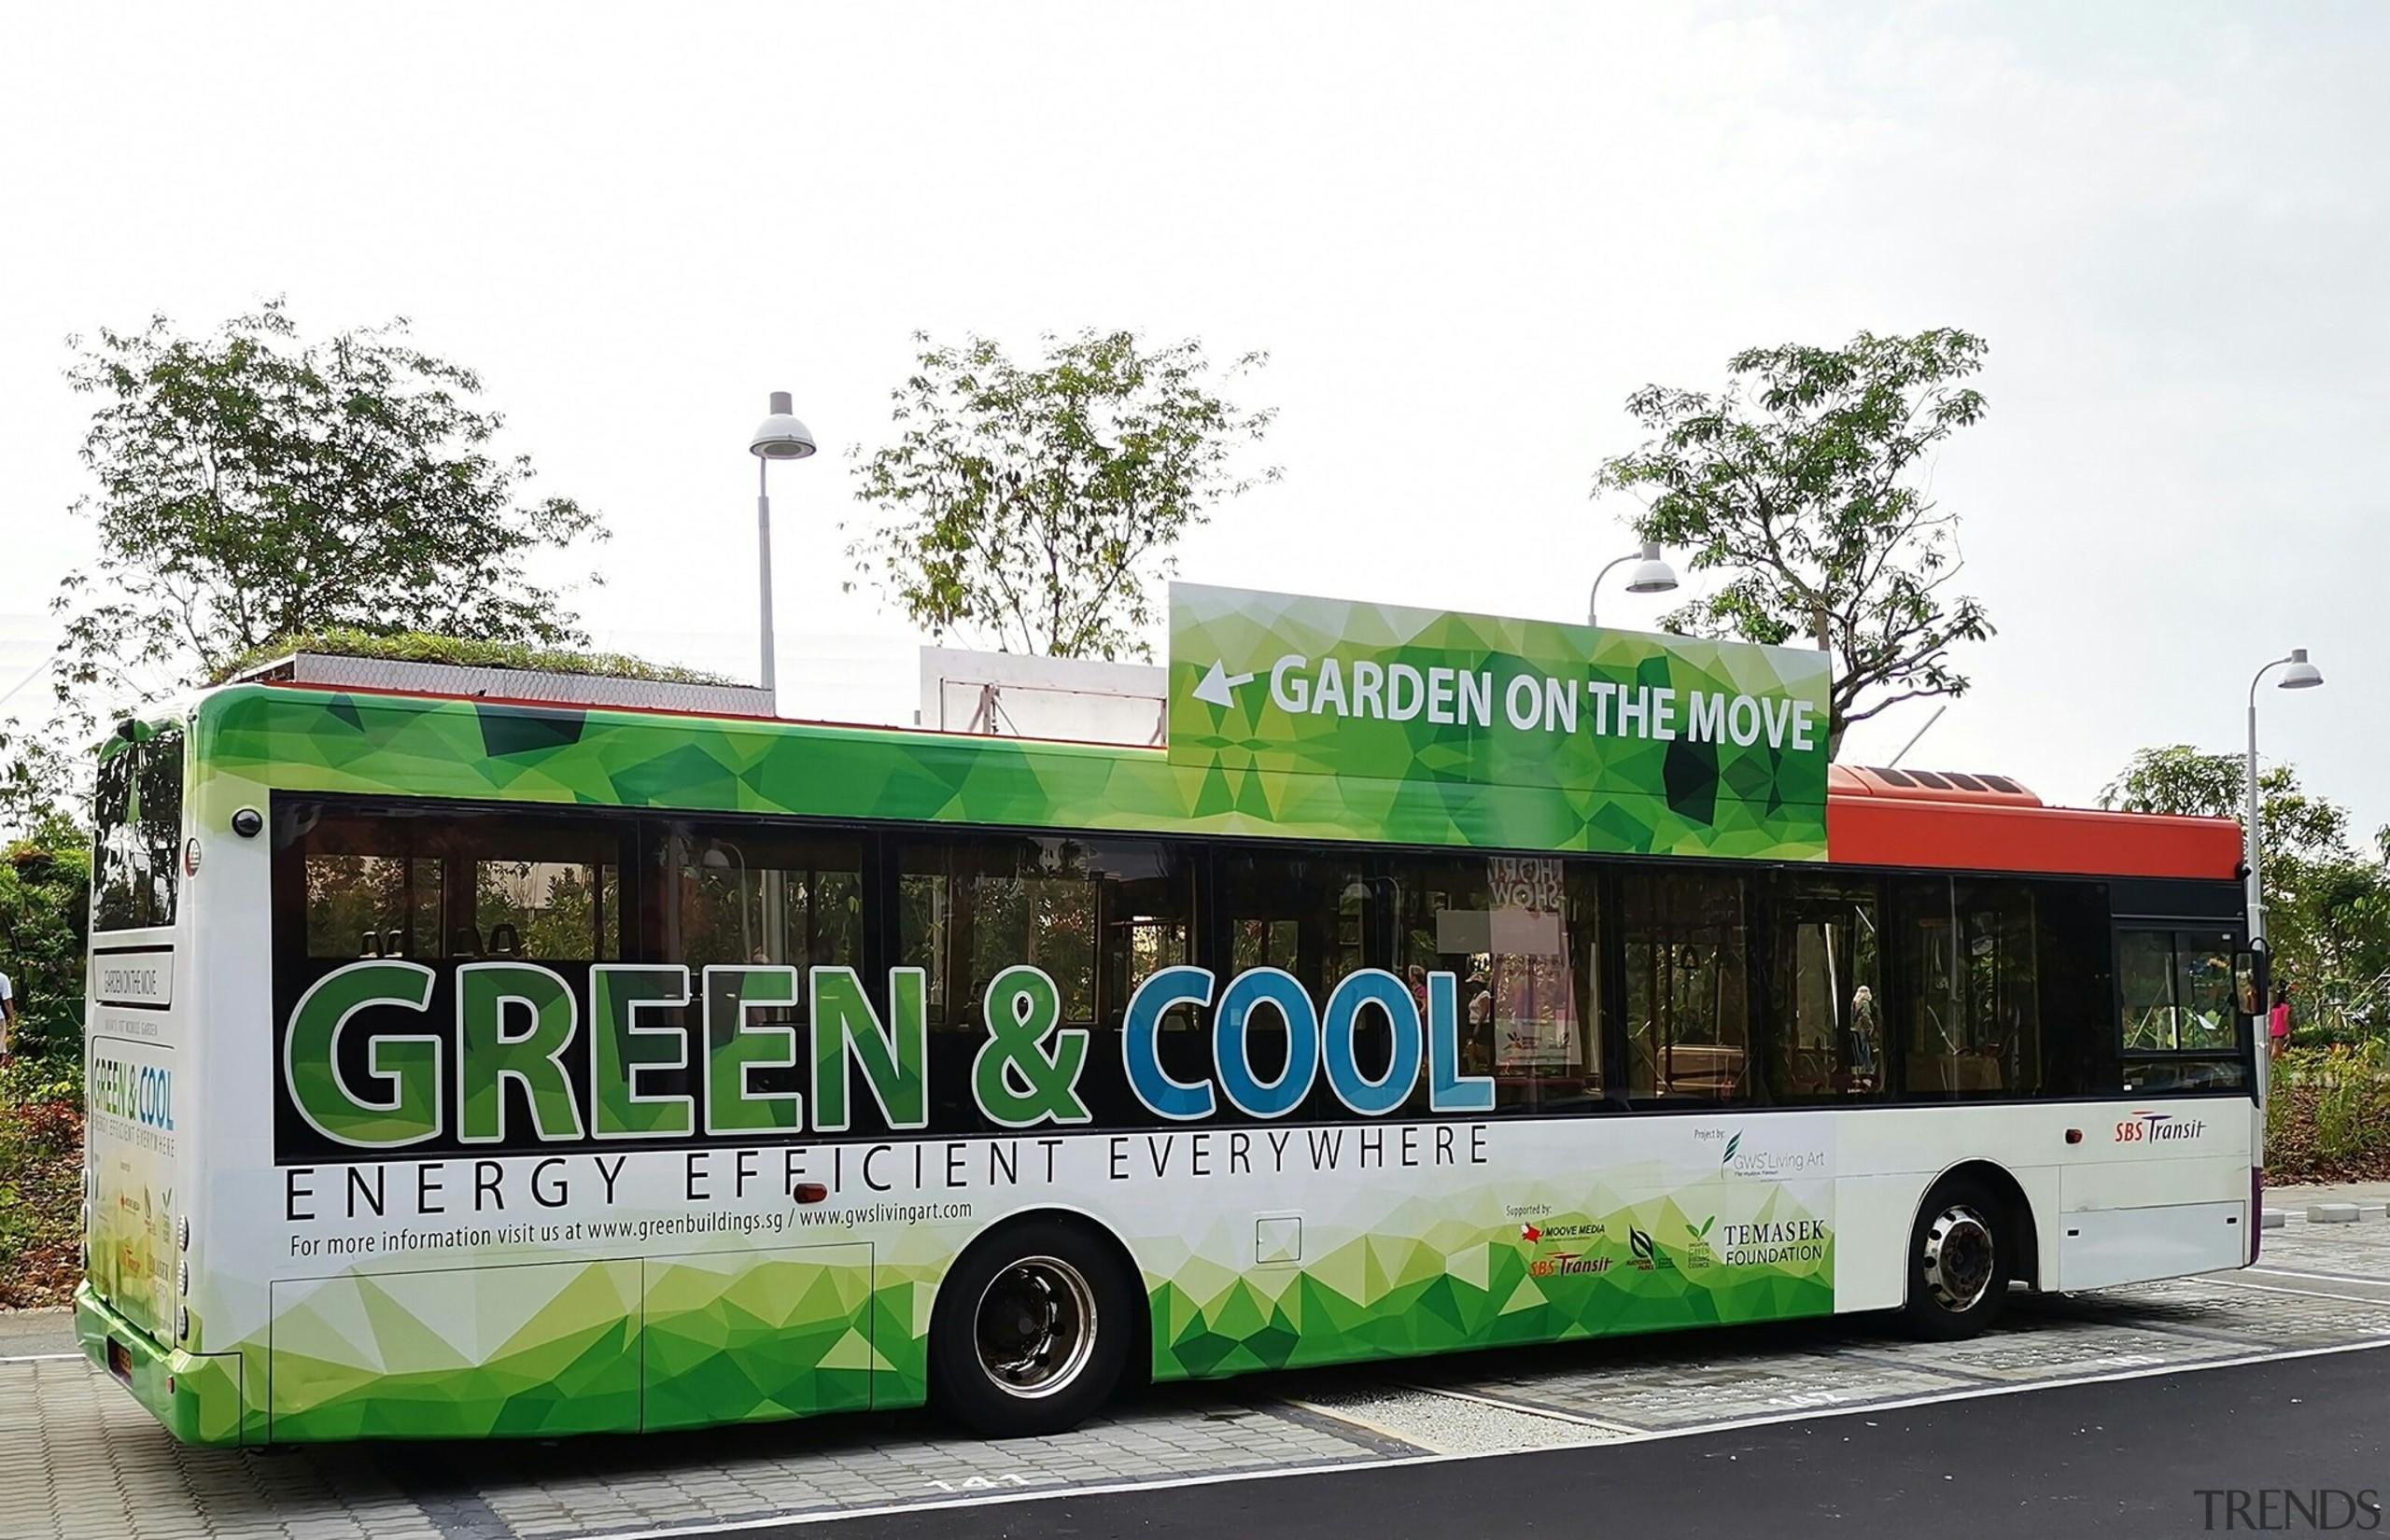 Singapore green-roofed bus initiative - bus | car bus, car, double-decker bus, mode of transport, motor vehicle, public transport, tour bus service, transport, vehicle, white